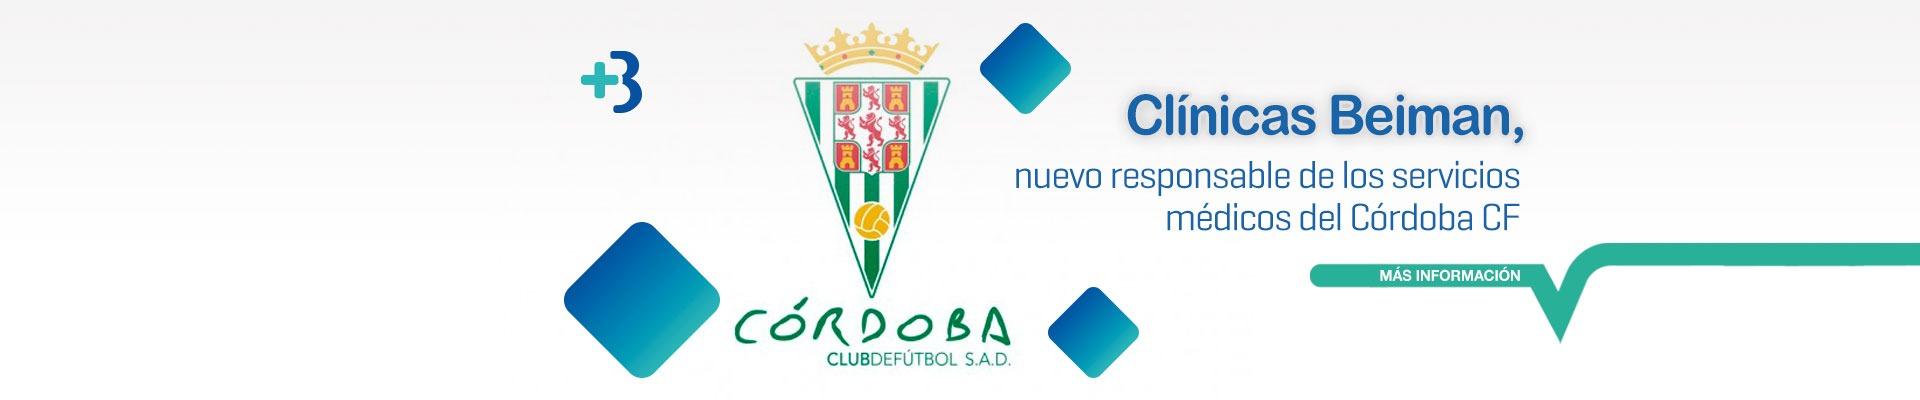 Córdoba CF y Clínicas Beiman